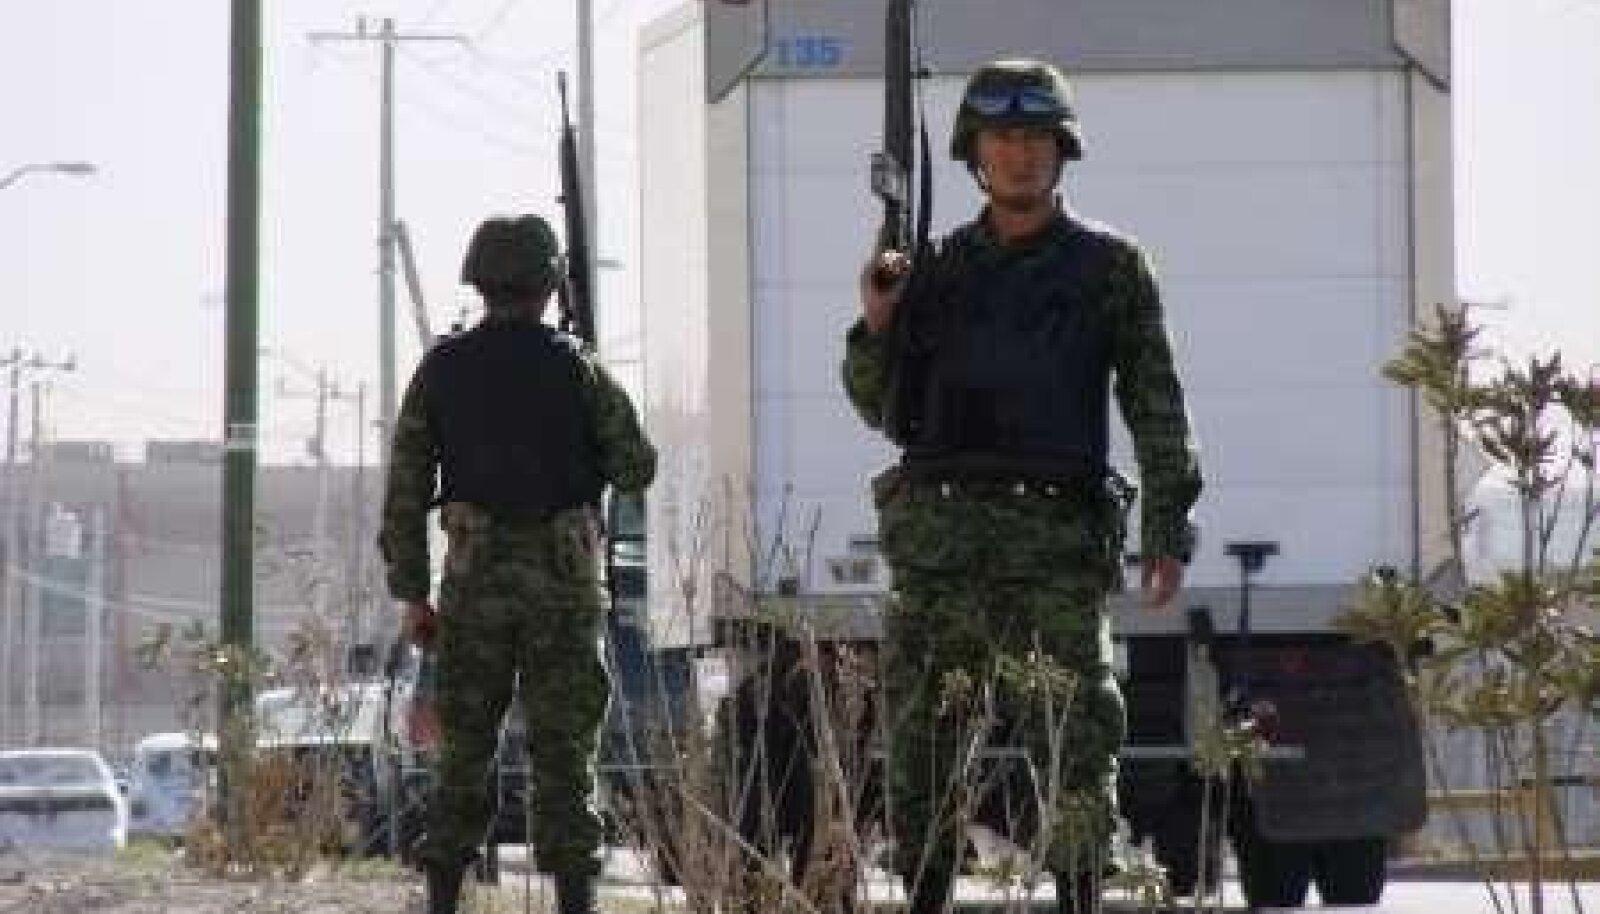 Mehhiko sõdurid Ciudad Juarezis korda loomas